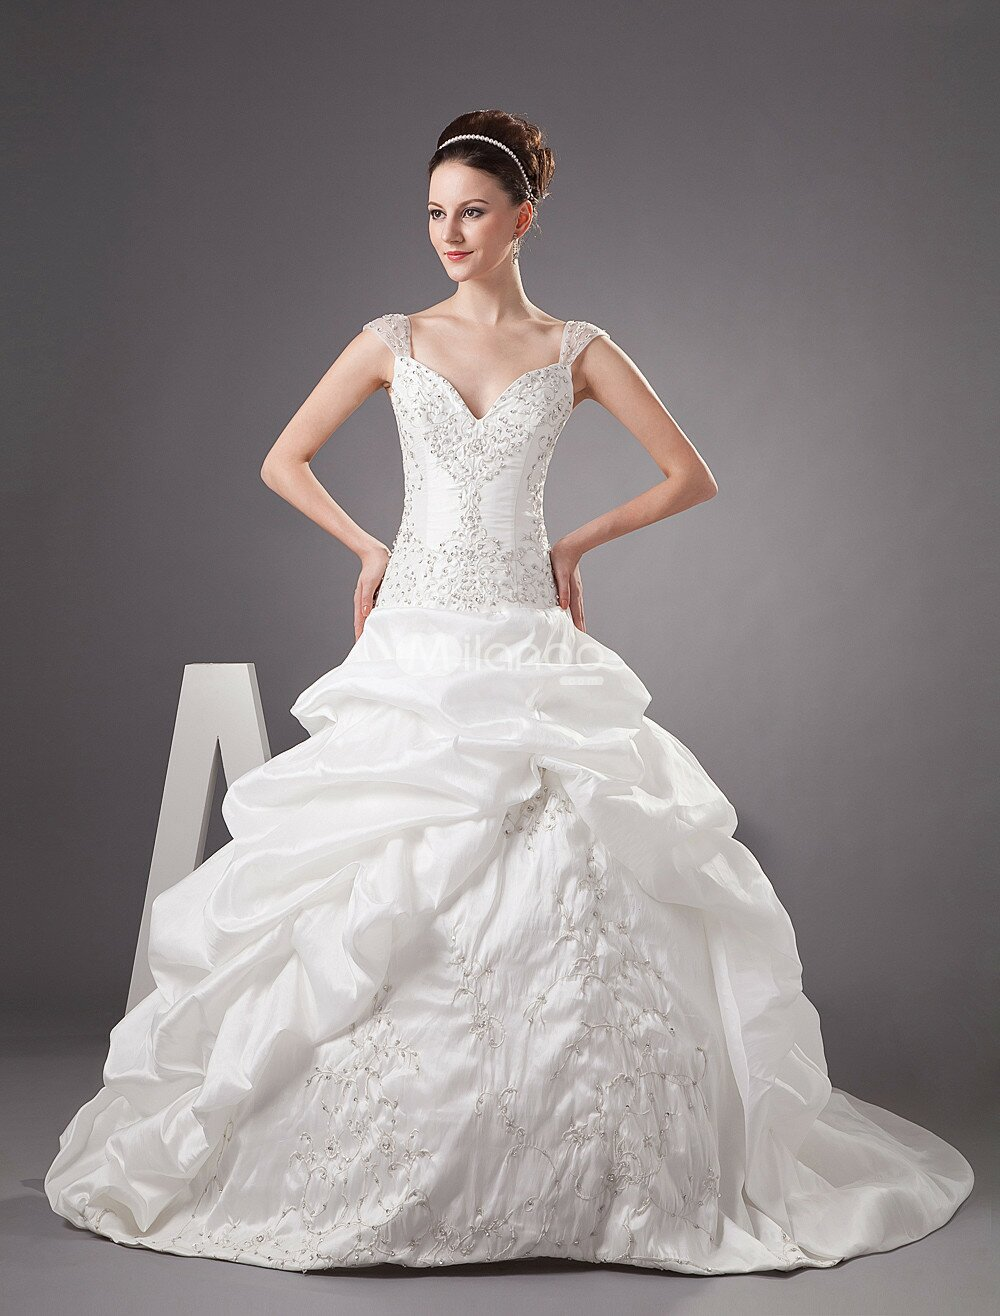 Wedding dresses cinderella style photo - 5